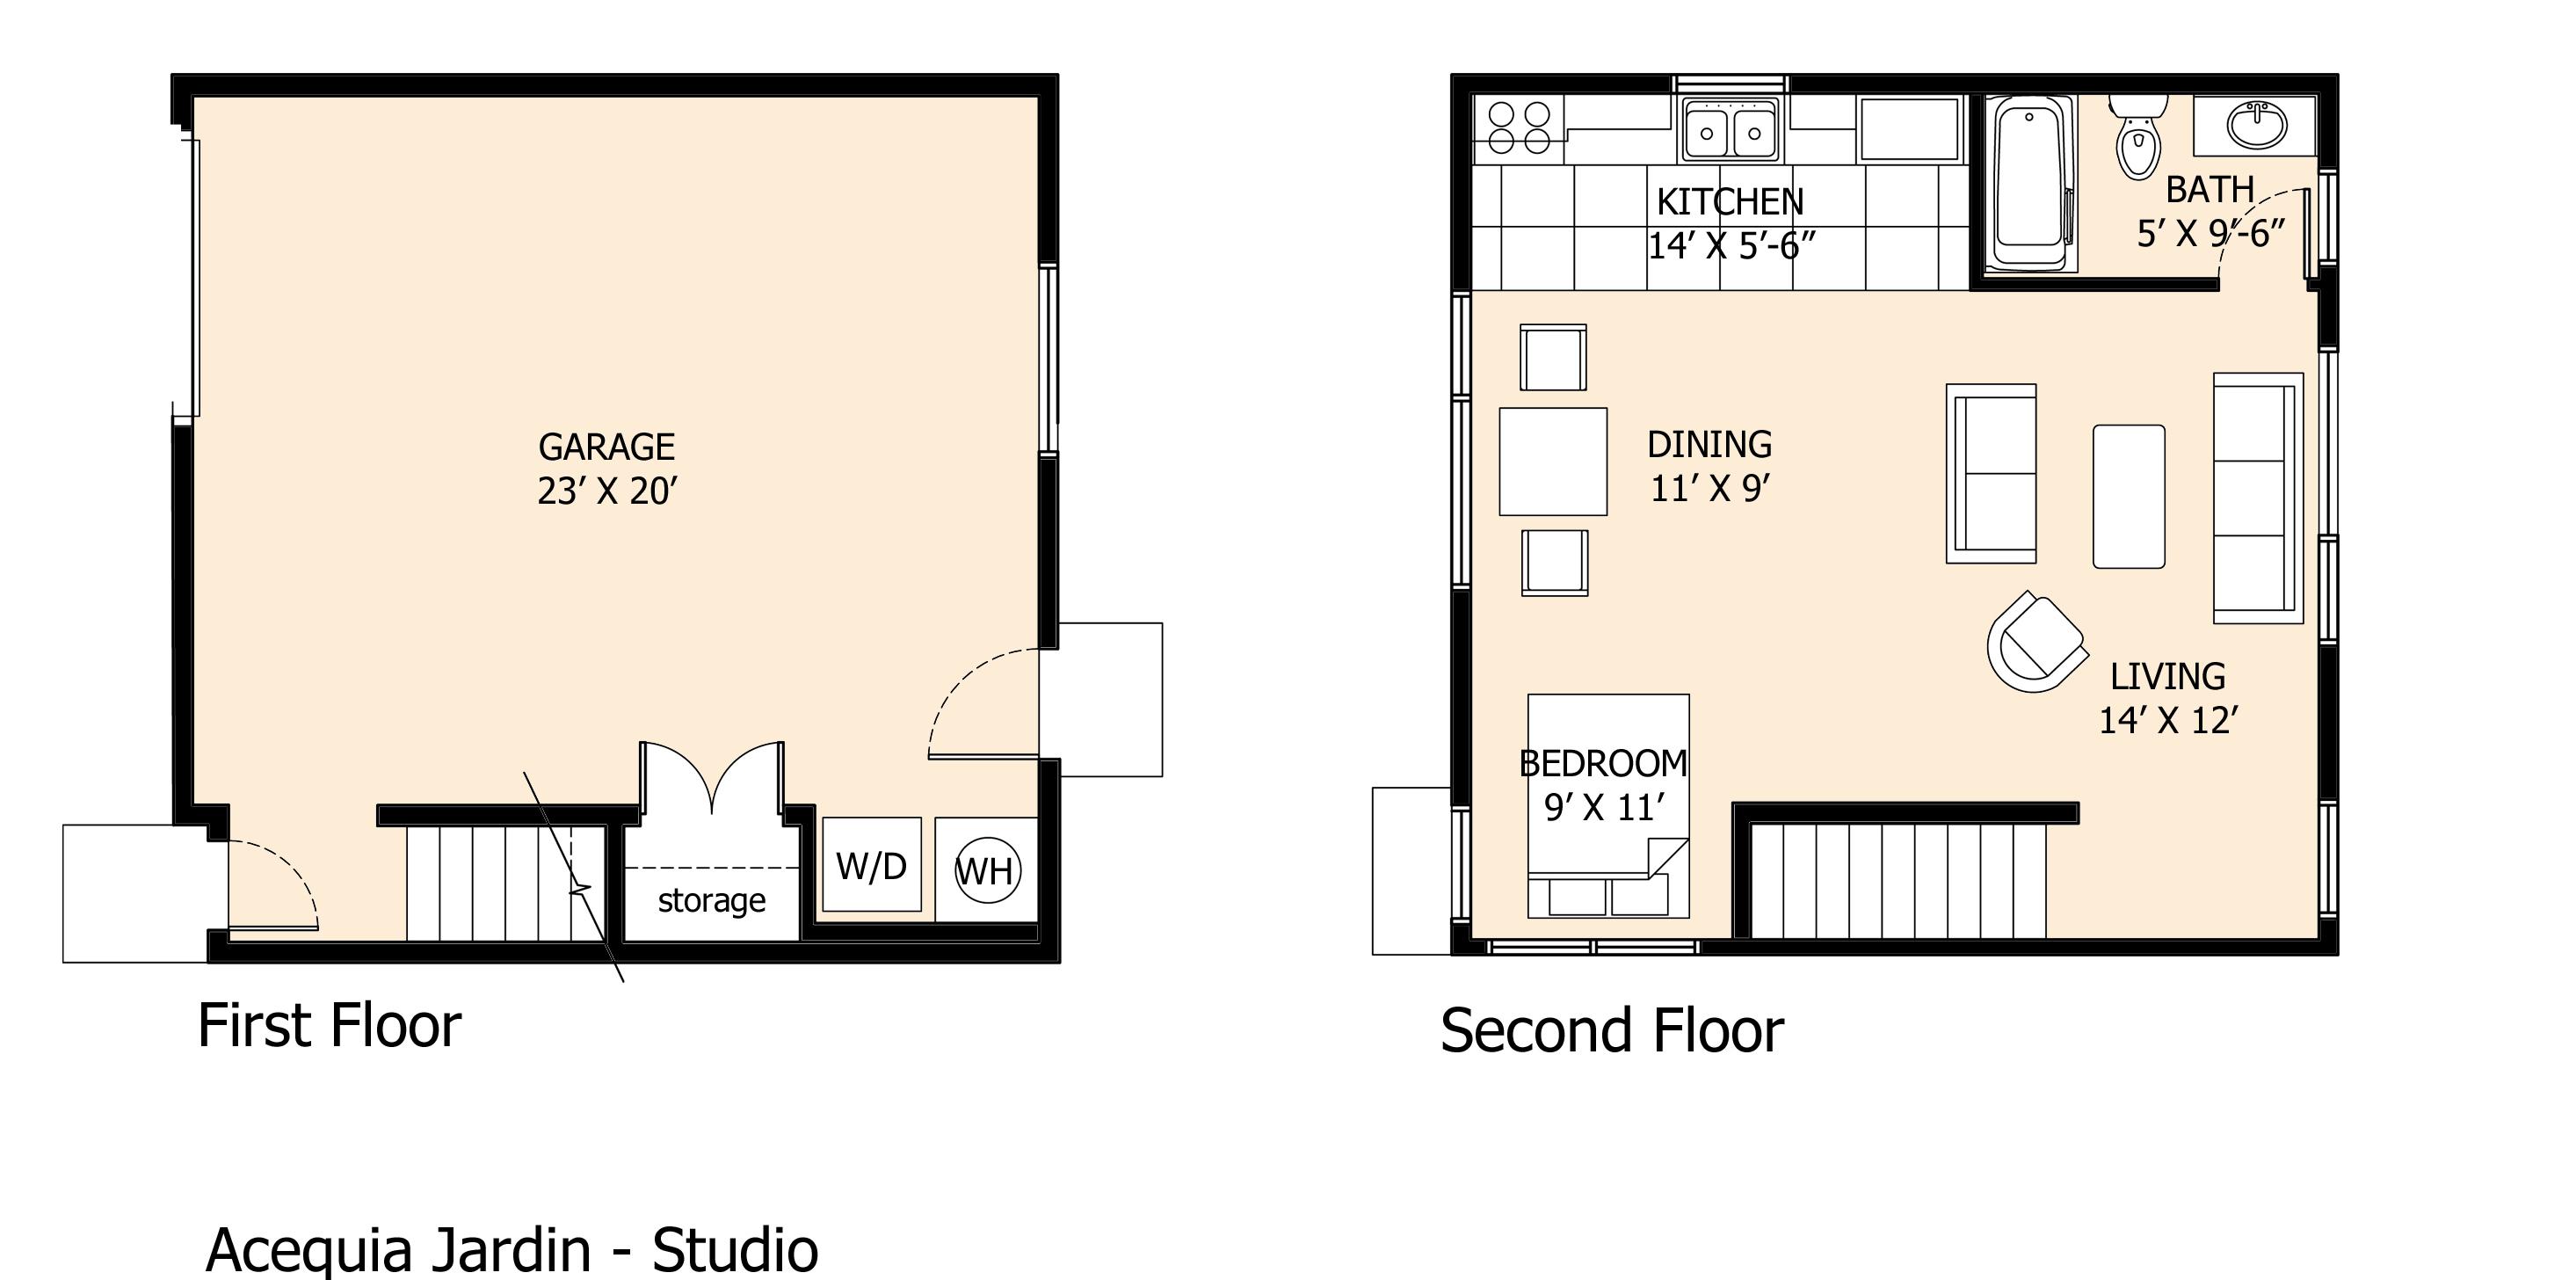 Casita Floor Plans Small Second Sun Co Trend Home Design